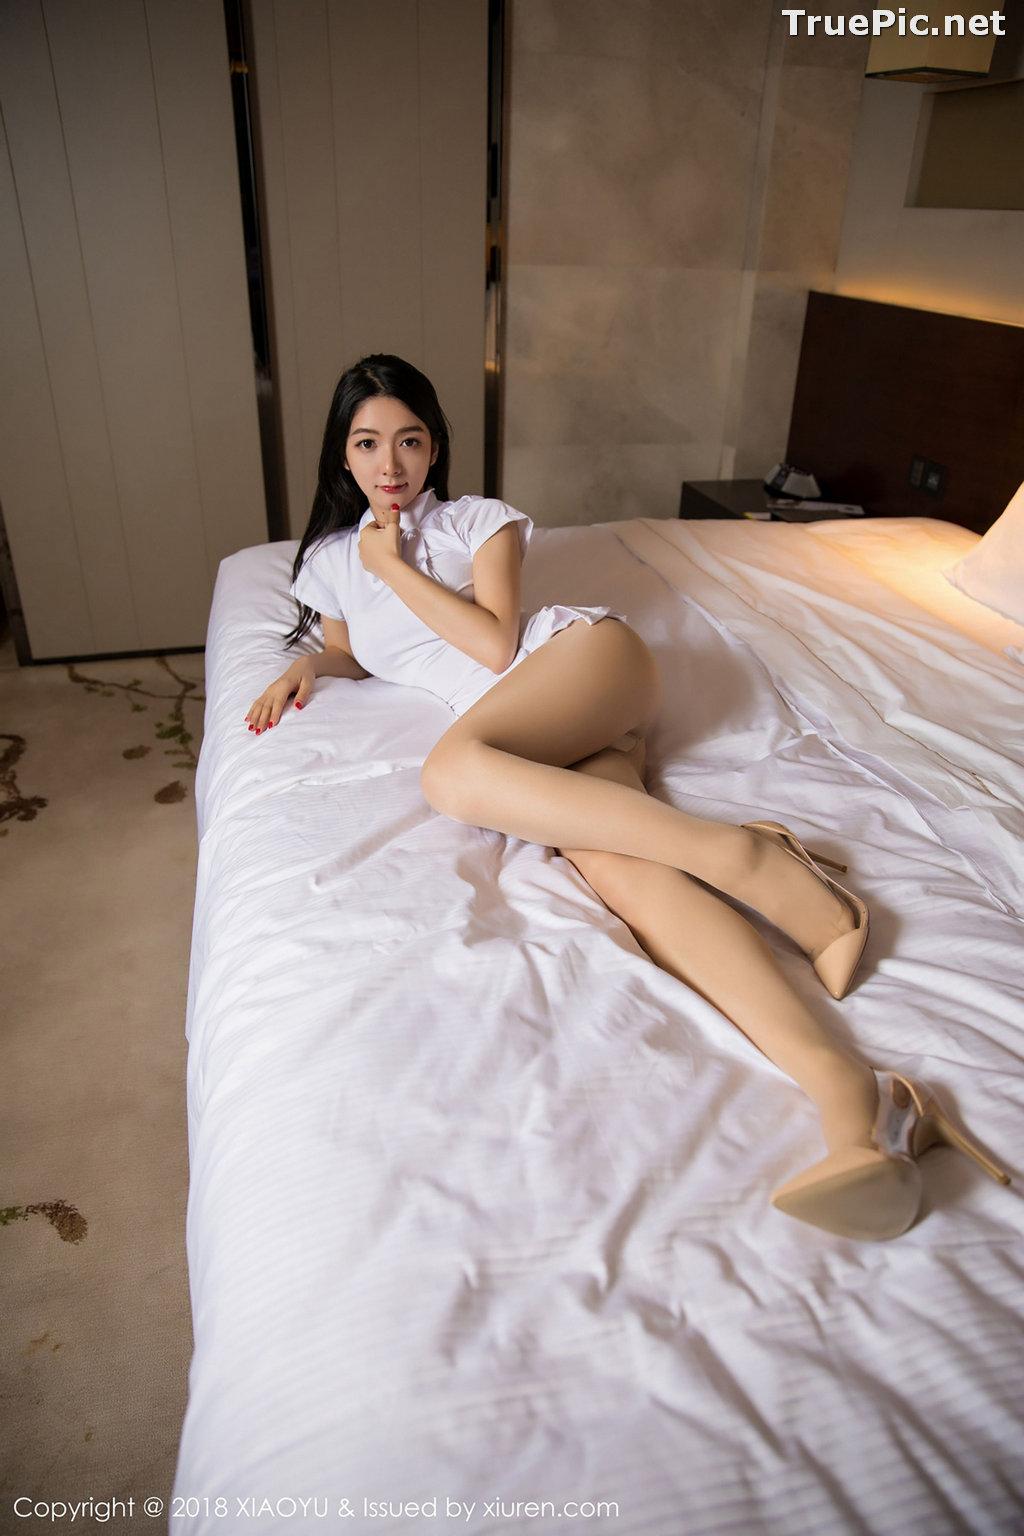 Image XiaoYu No.004 - Chinese Model - Xiao Reba (Angela喜欢猫) - White Sexy Nurse - TruePic.net - Picture-22